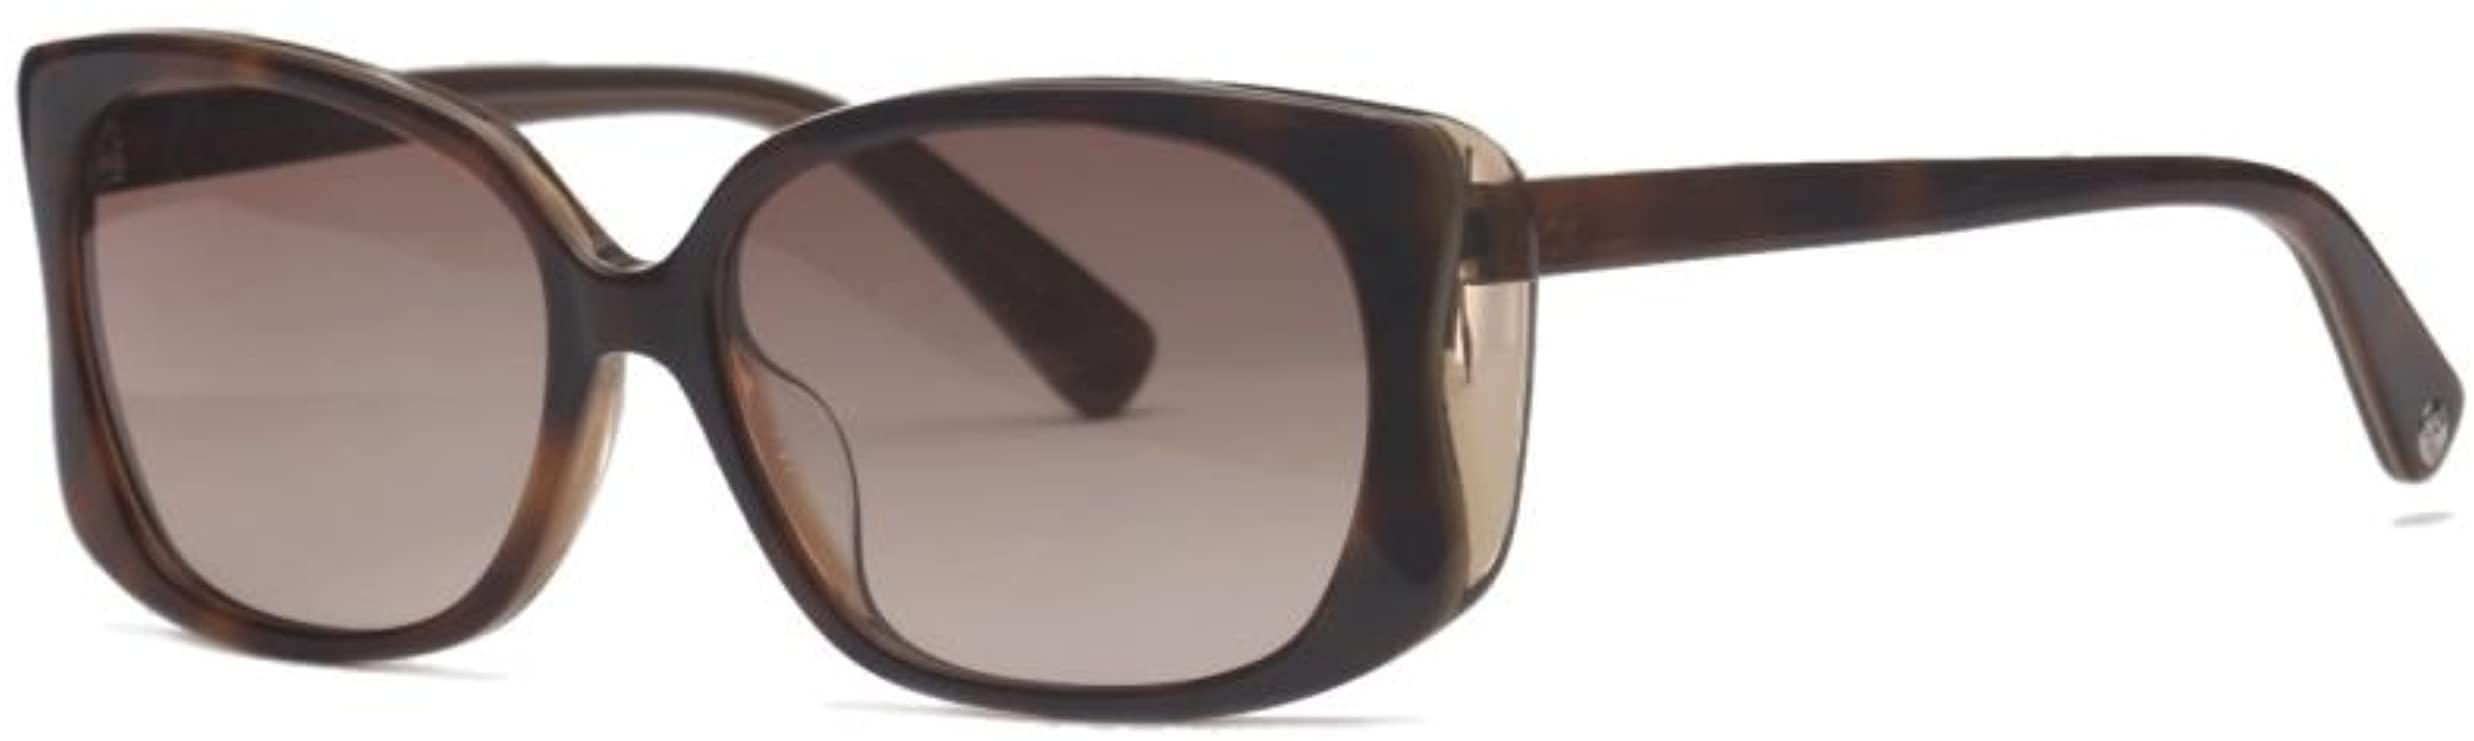 Calvin Klein CK4091S 311 Sunglasses, Brown